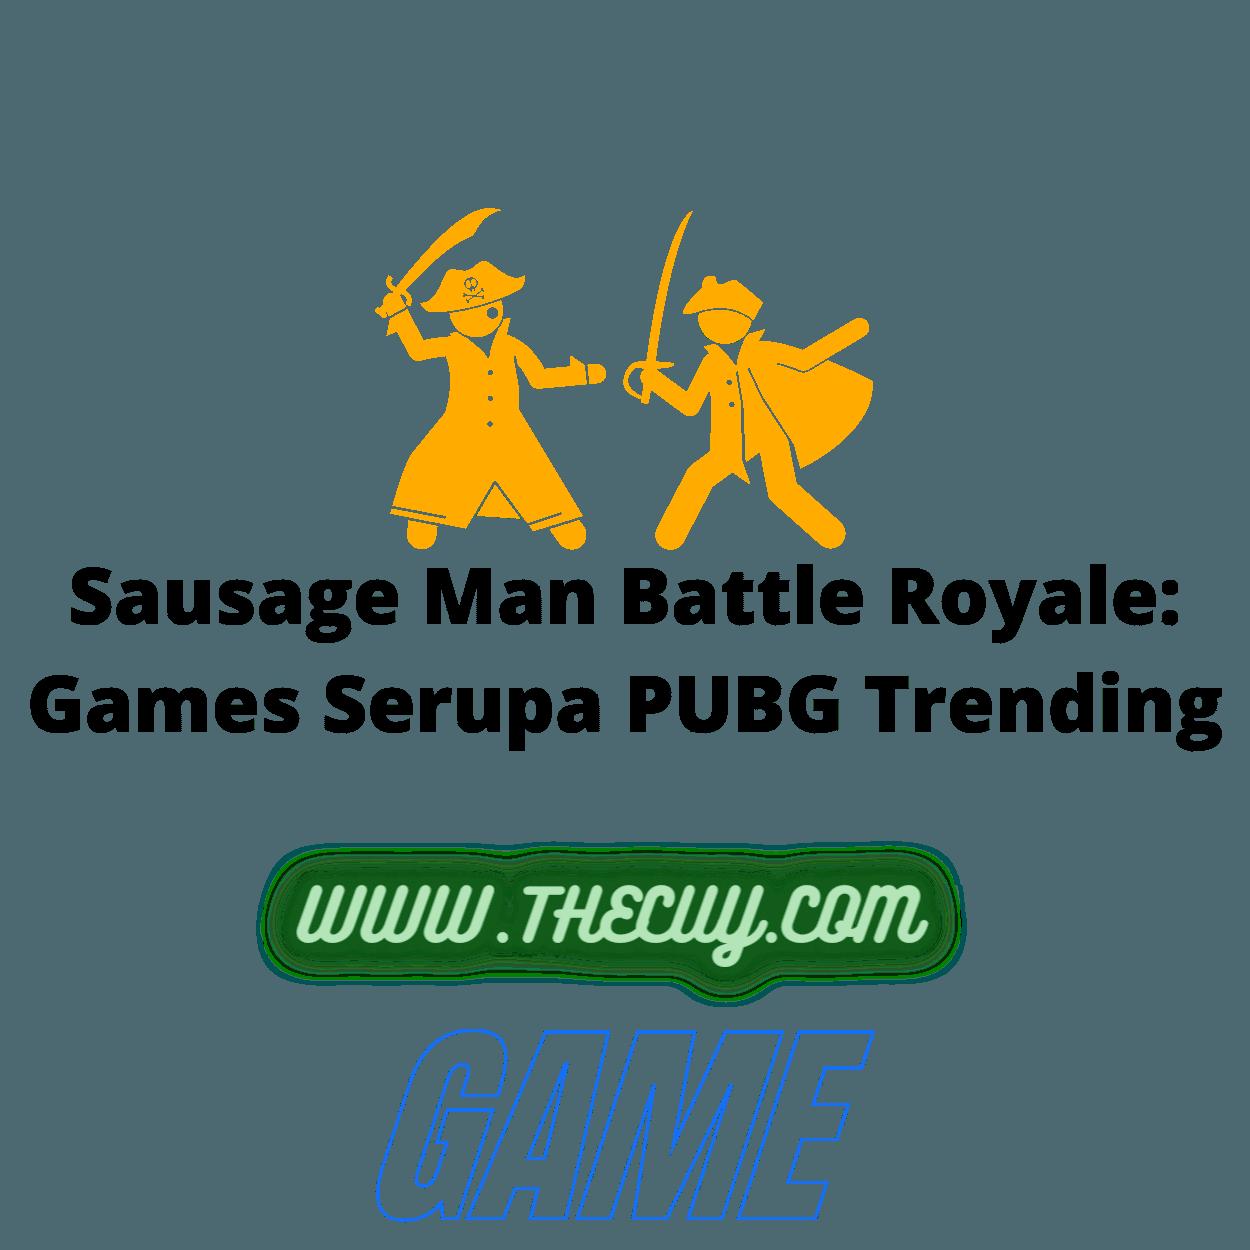 Sausage Man Battle Royale: Games Serupa PUBG Trending